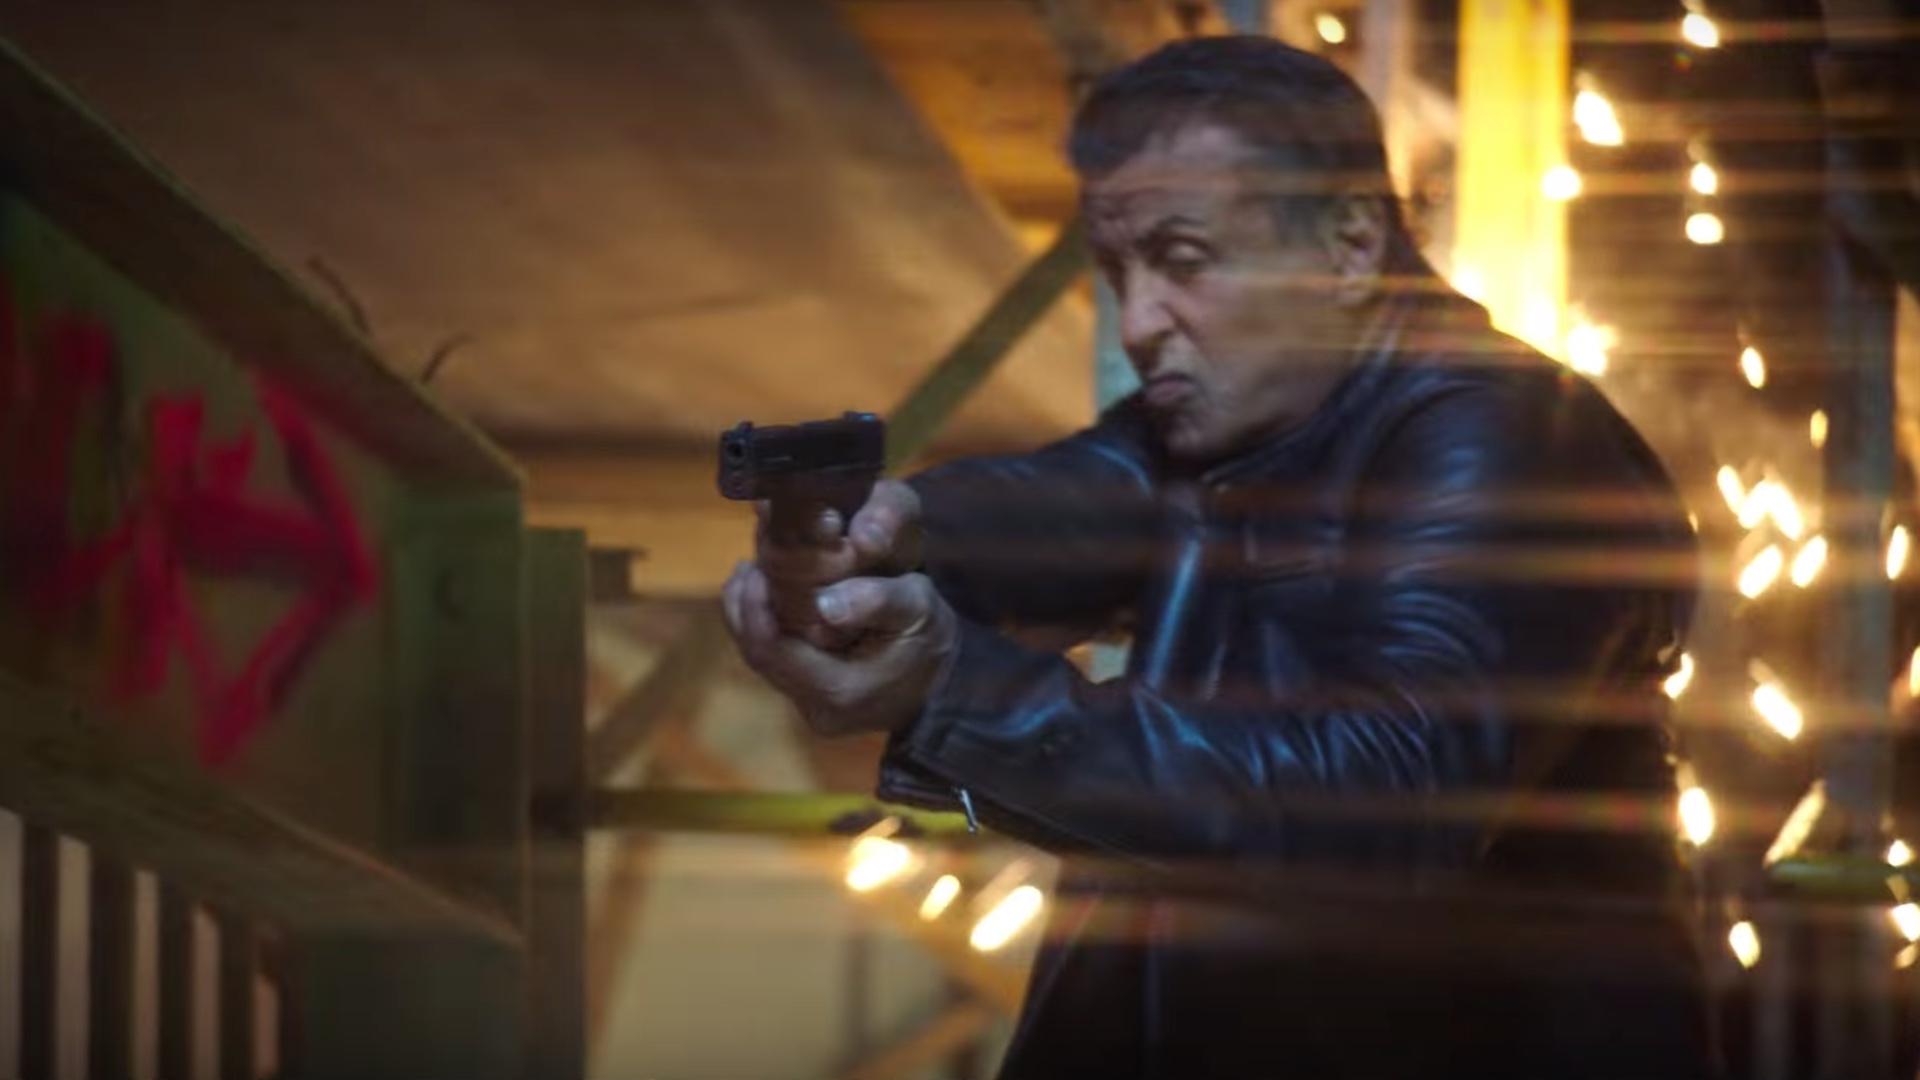 trailer-for-sylvester-stallones-action-crime-thriller-backtrace-social.jpg